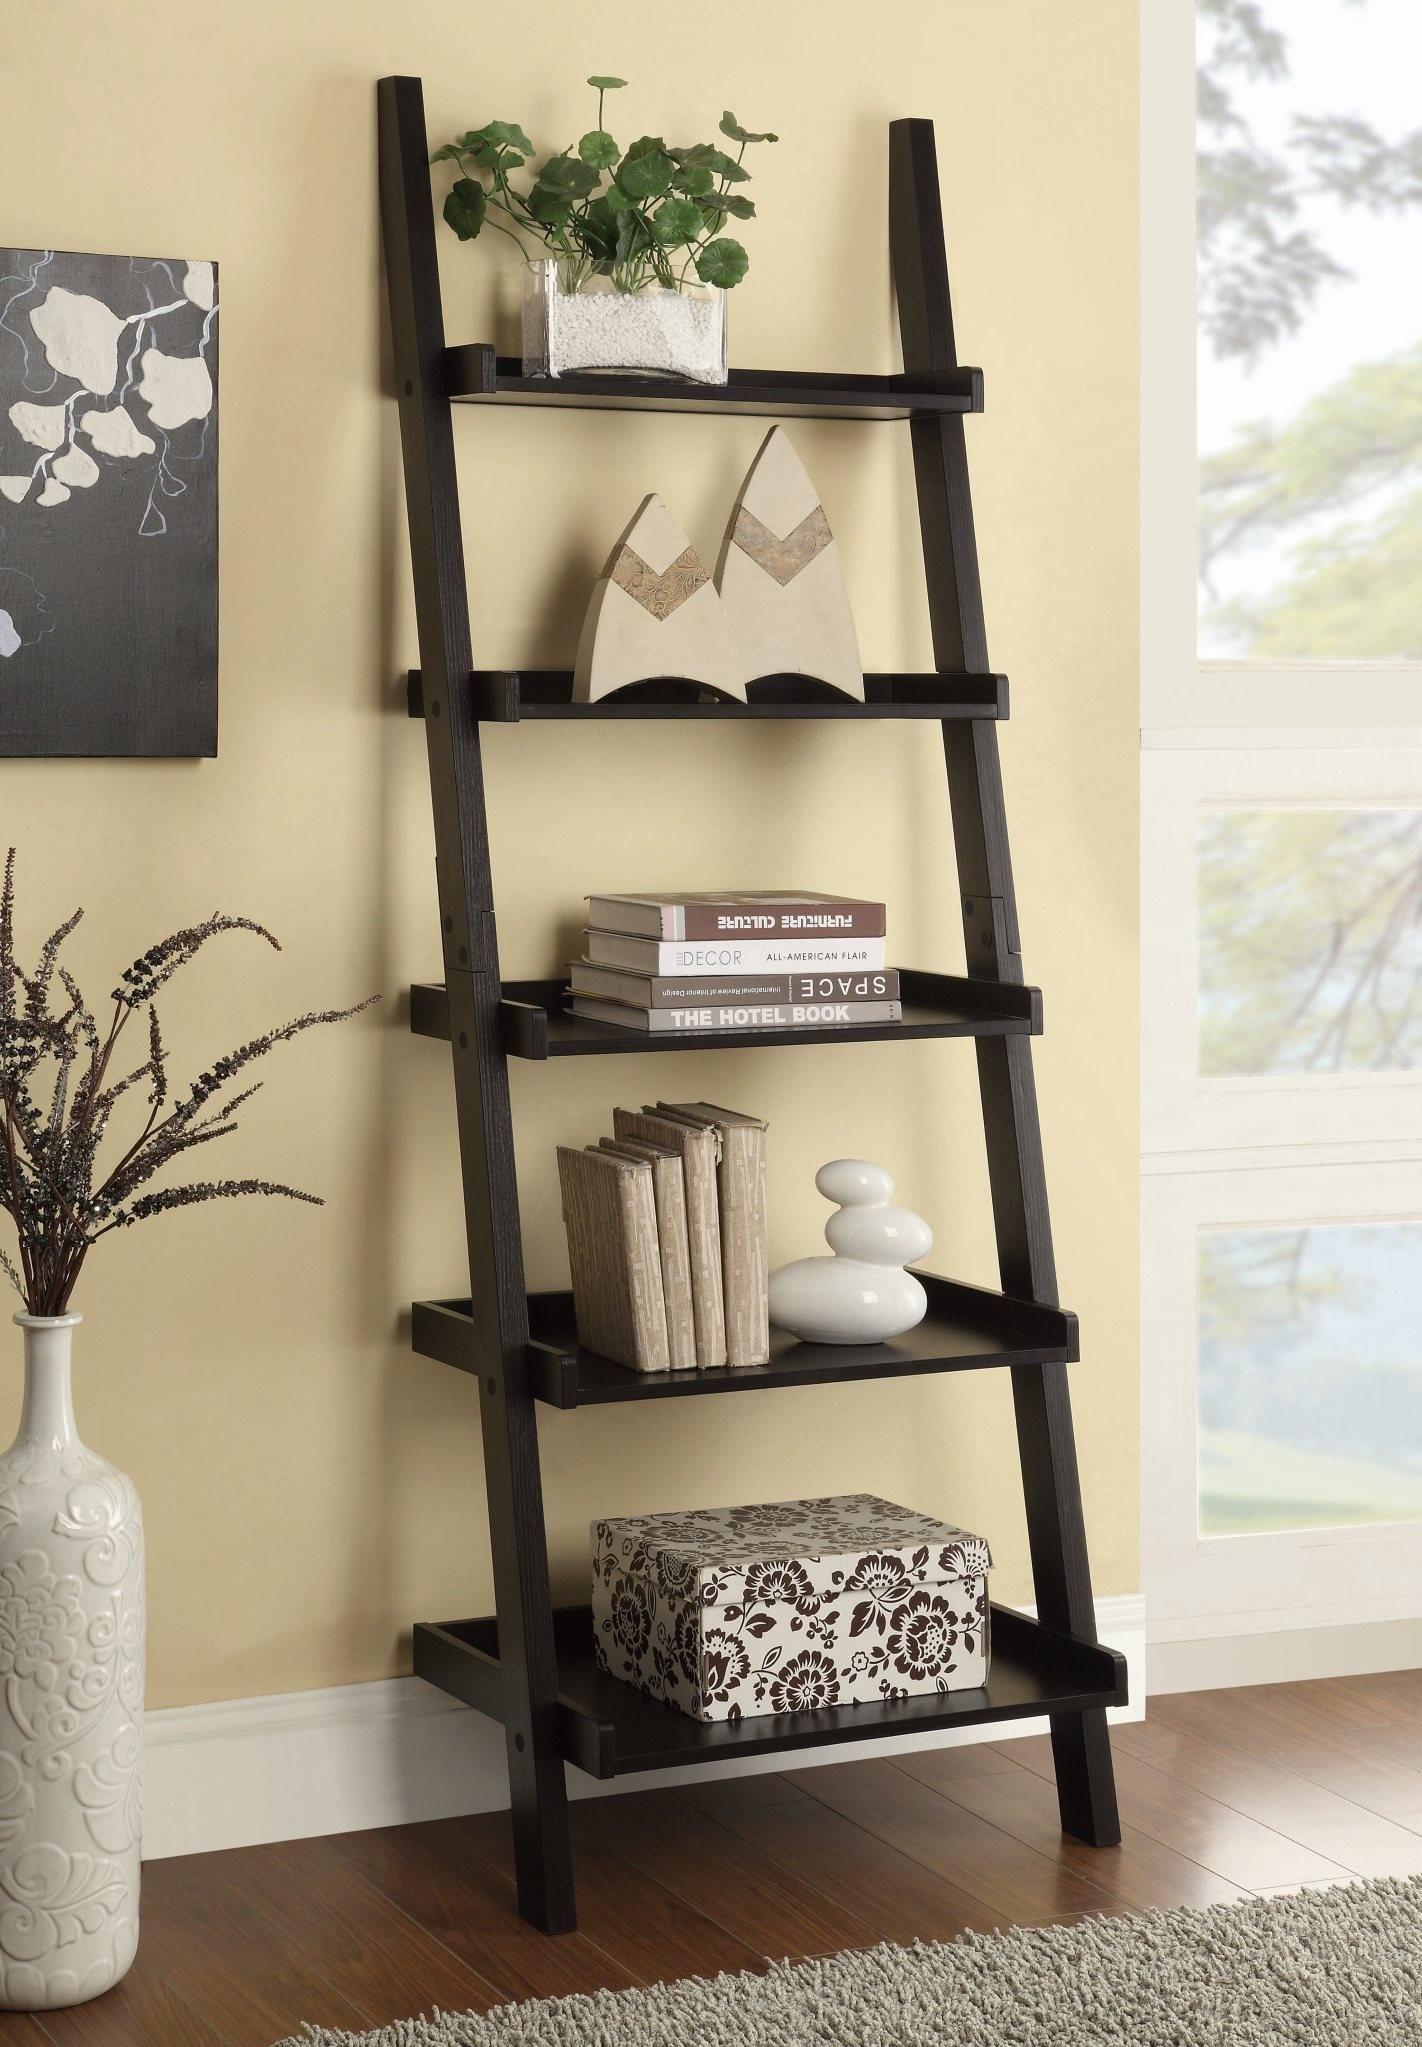 bookcase shoptv detail shelf mainstays bookcases leaning ladder espresso